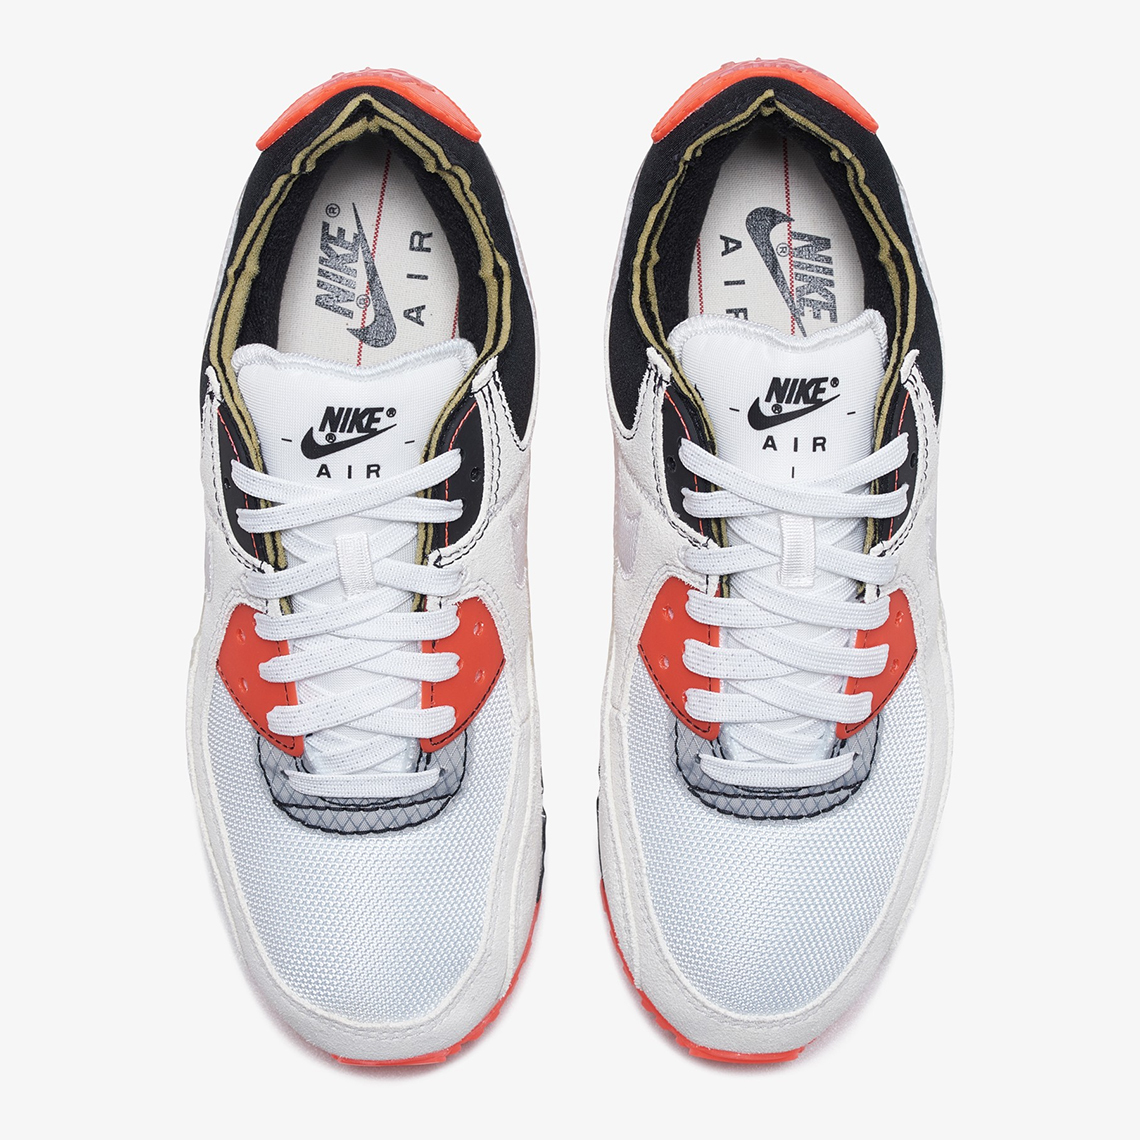 Nike Air Max 90 ''Archetype'' - DC7856-100